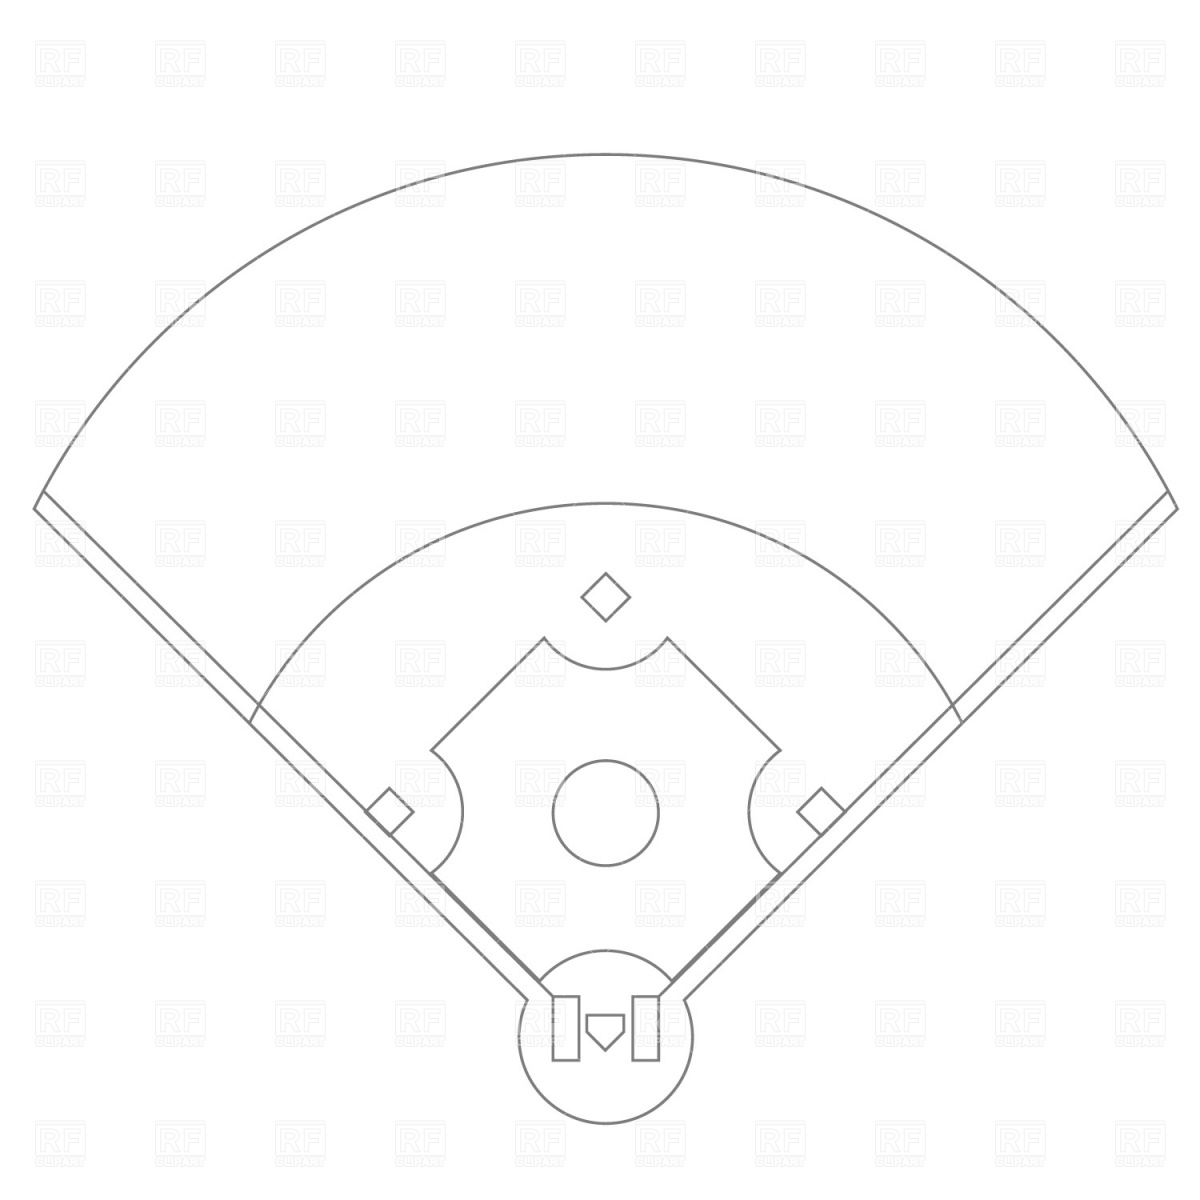 Baseball Field Diagram Baseball Field Diagram Printable Wiring Diagram Web